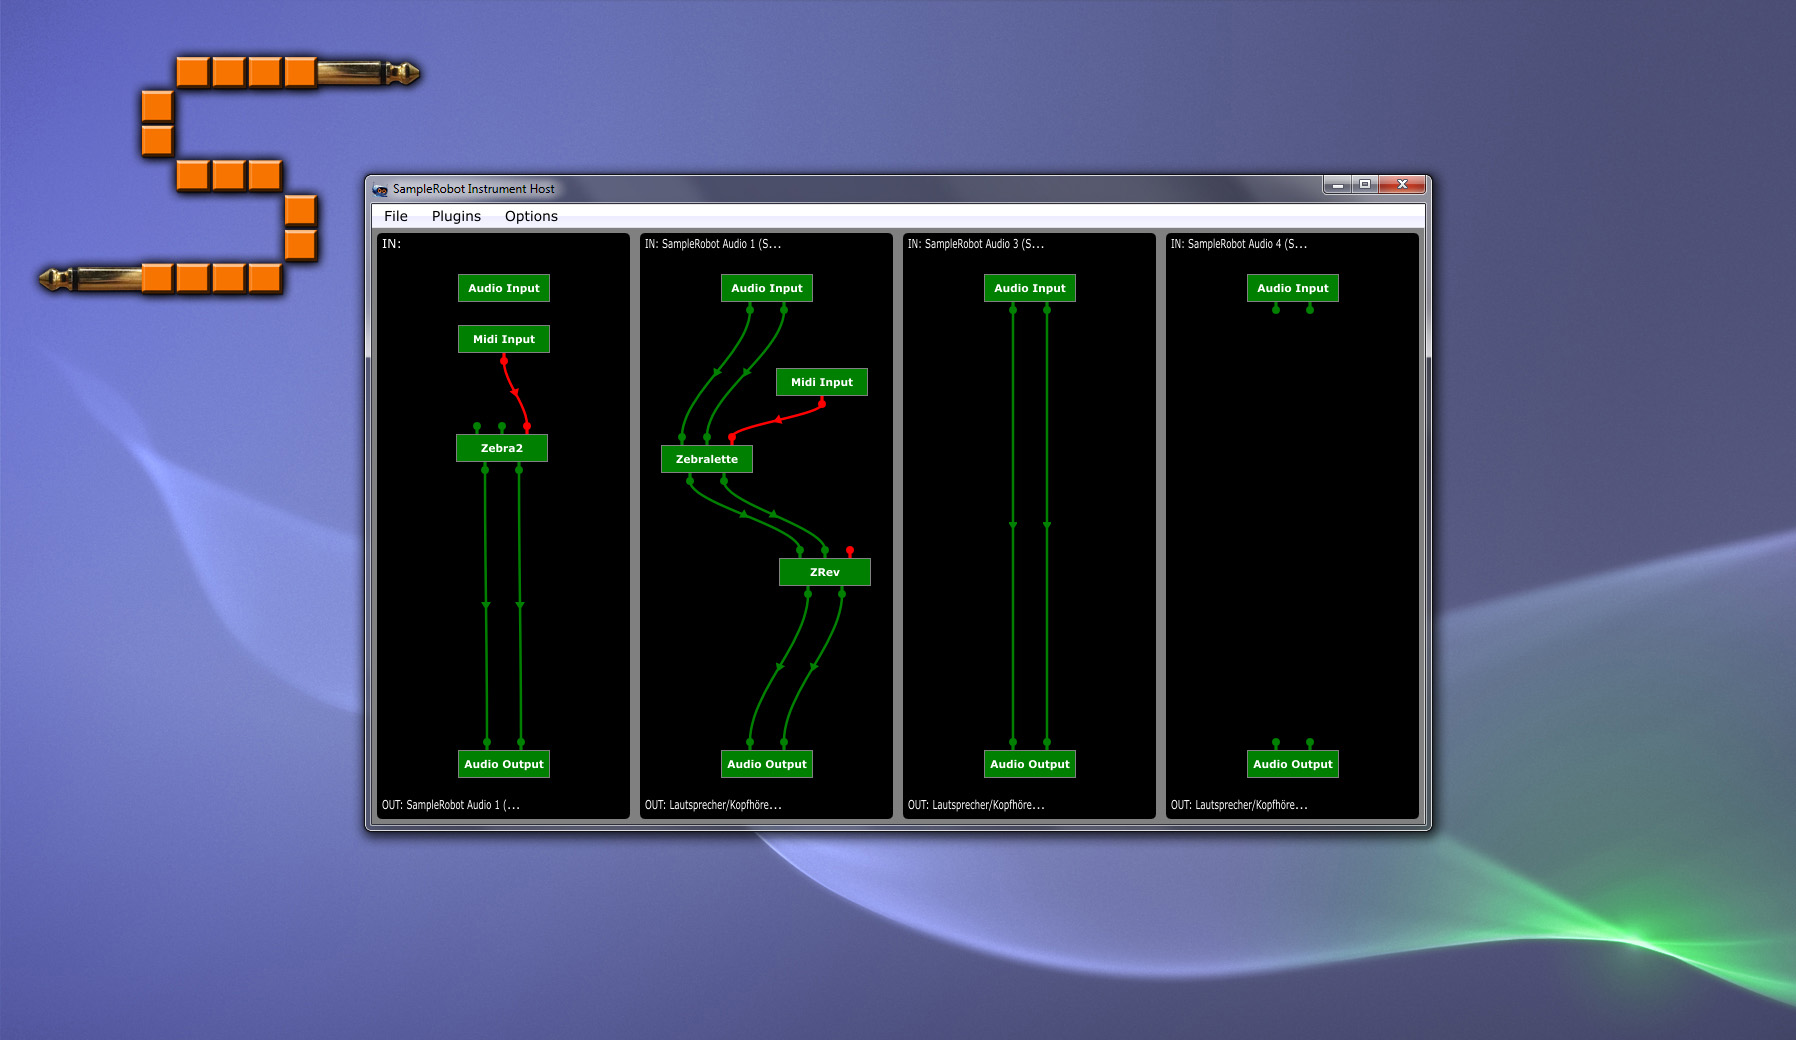 SampleRobot Virtual Cable + Instrument Host